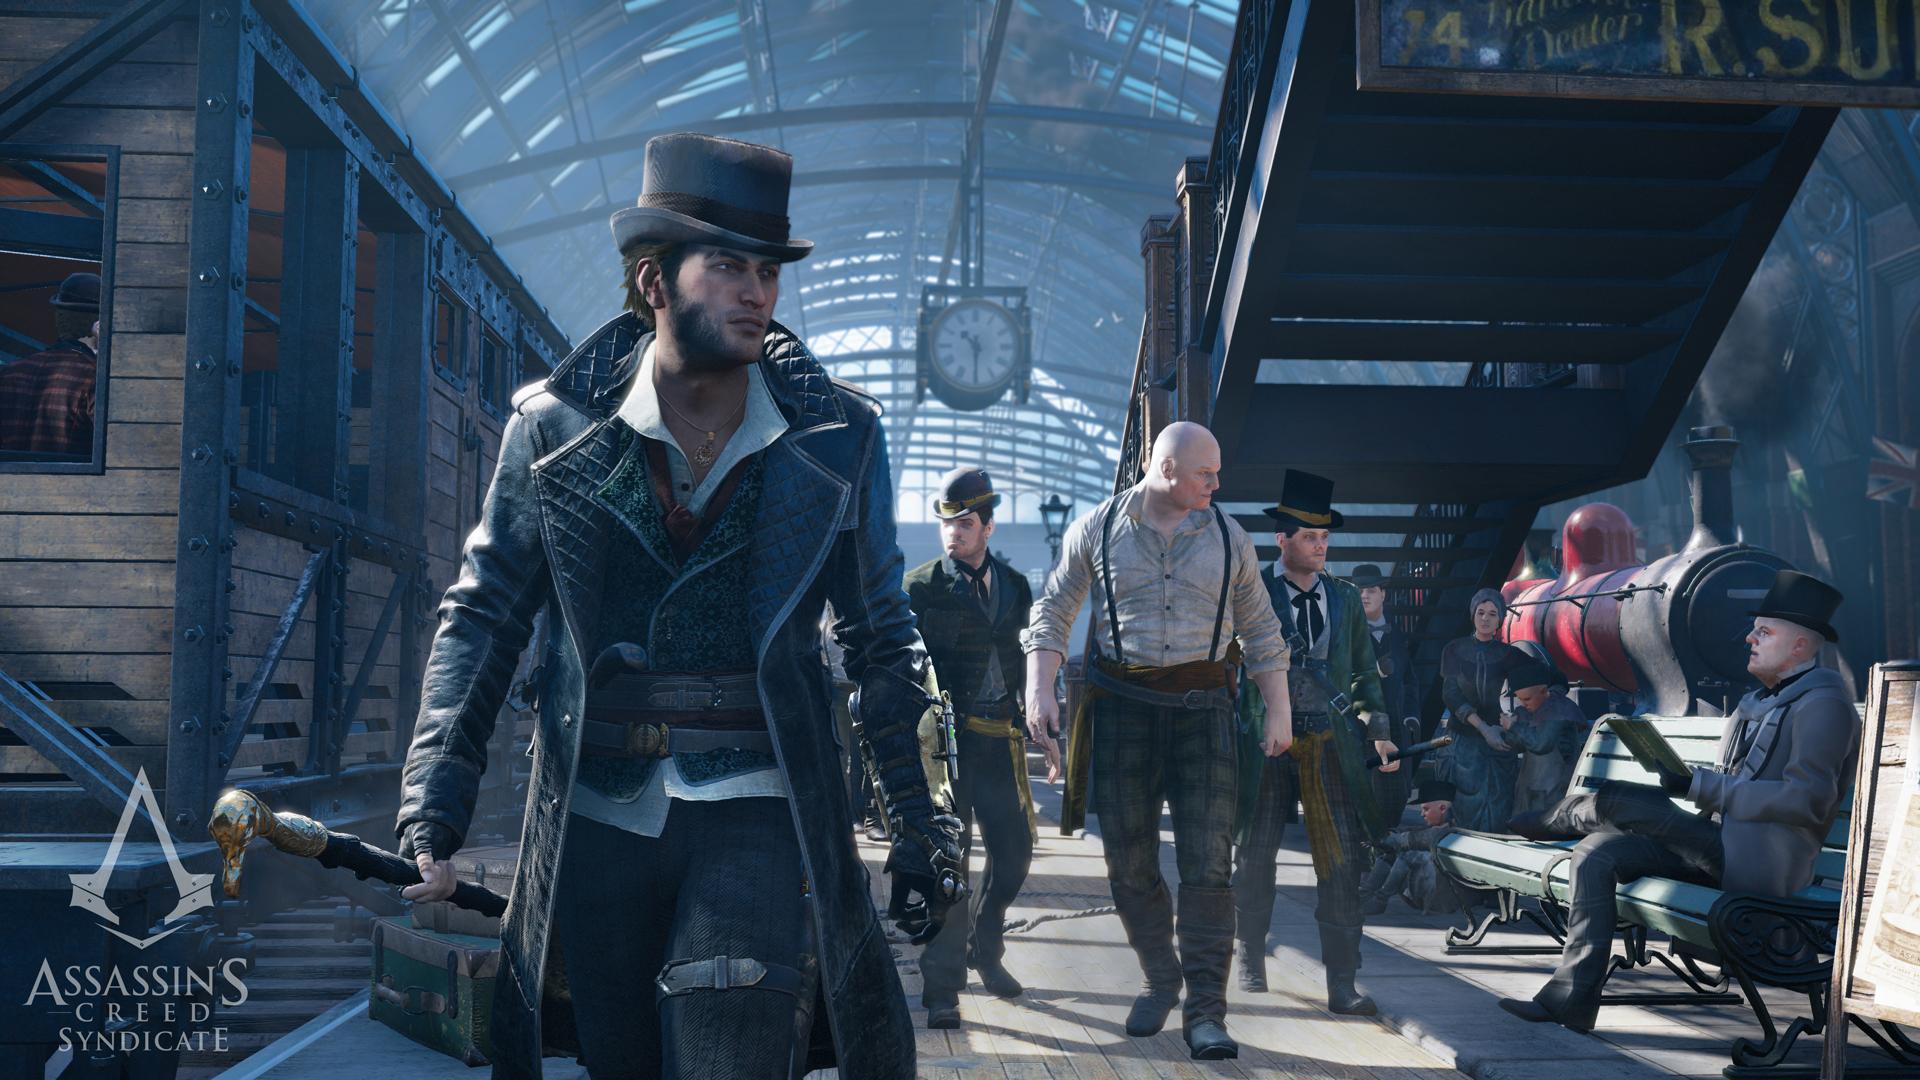 Assassin'S Creed Syndicate ESPAÑOL PC Full + Update v1.21 (CODEX) + REPACK 6 DVD5 (JPW) 4